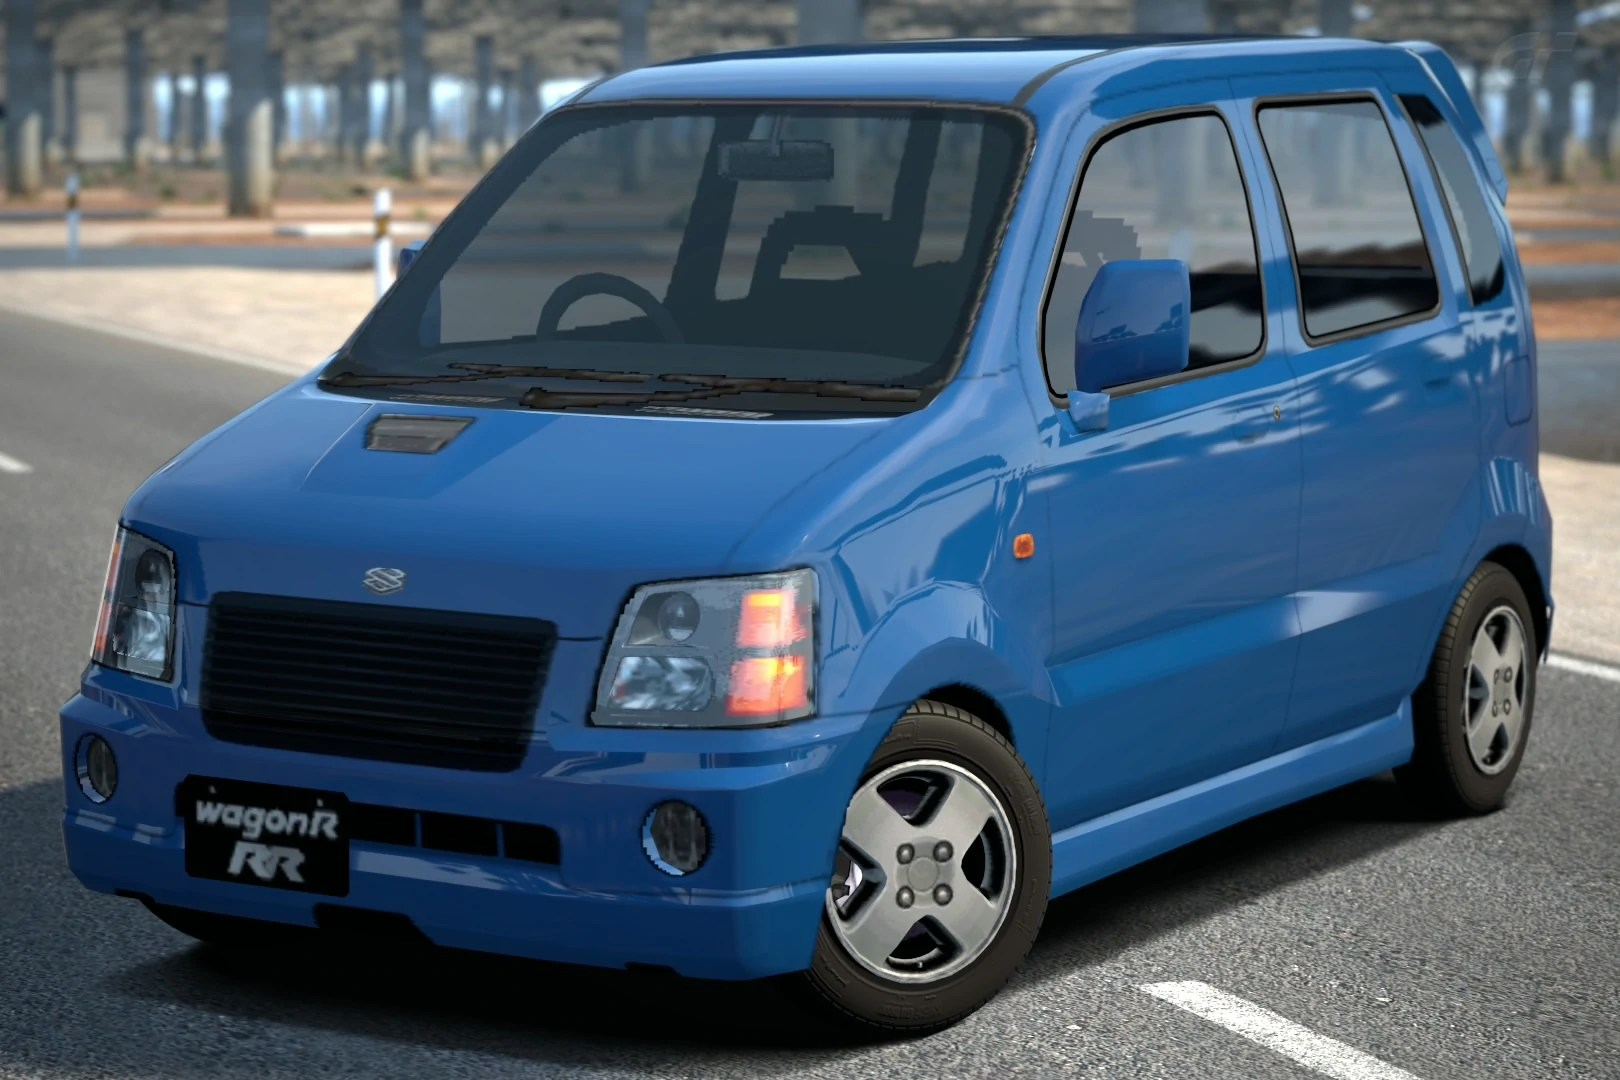 medium resolution of suzuki wagon r rr 98